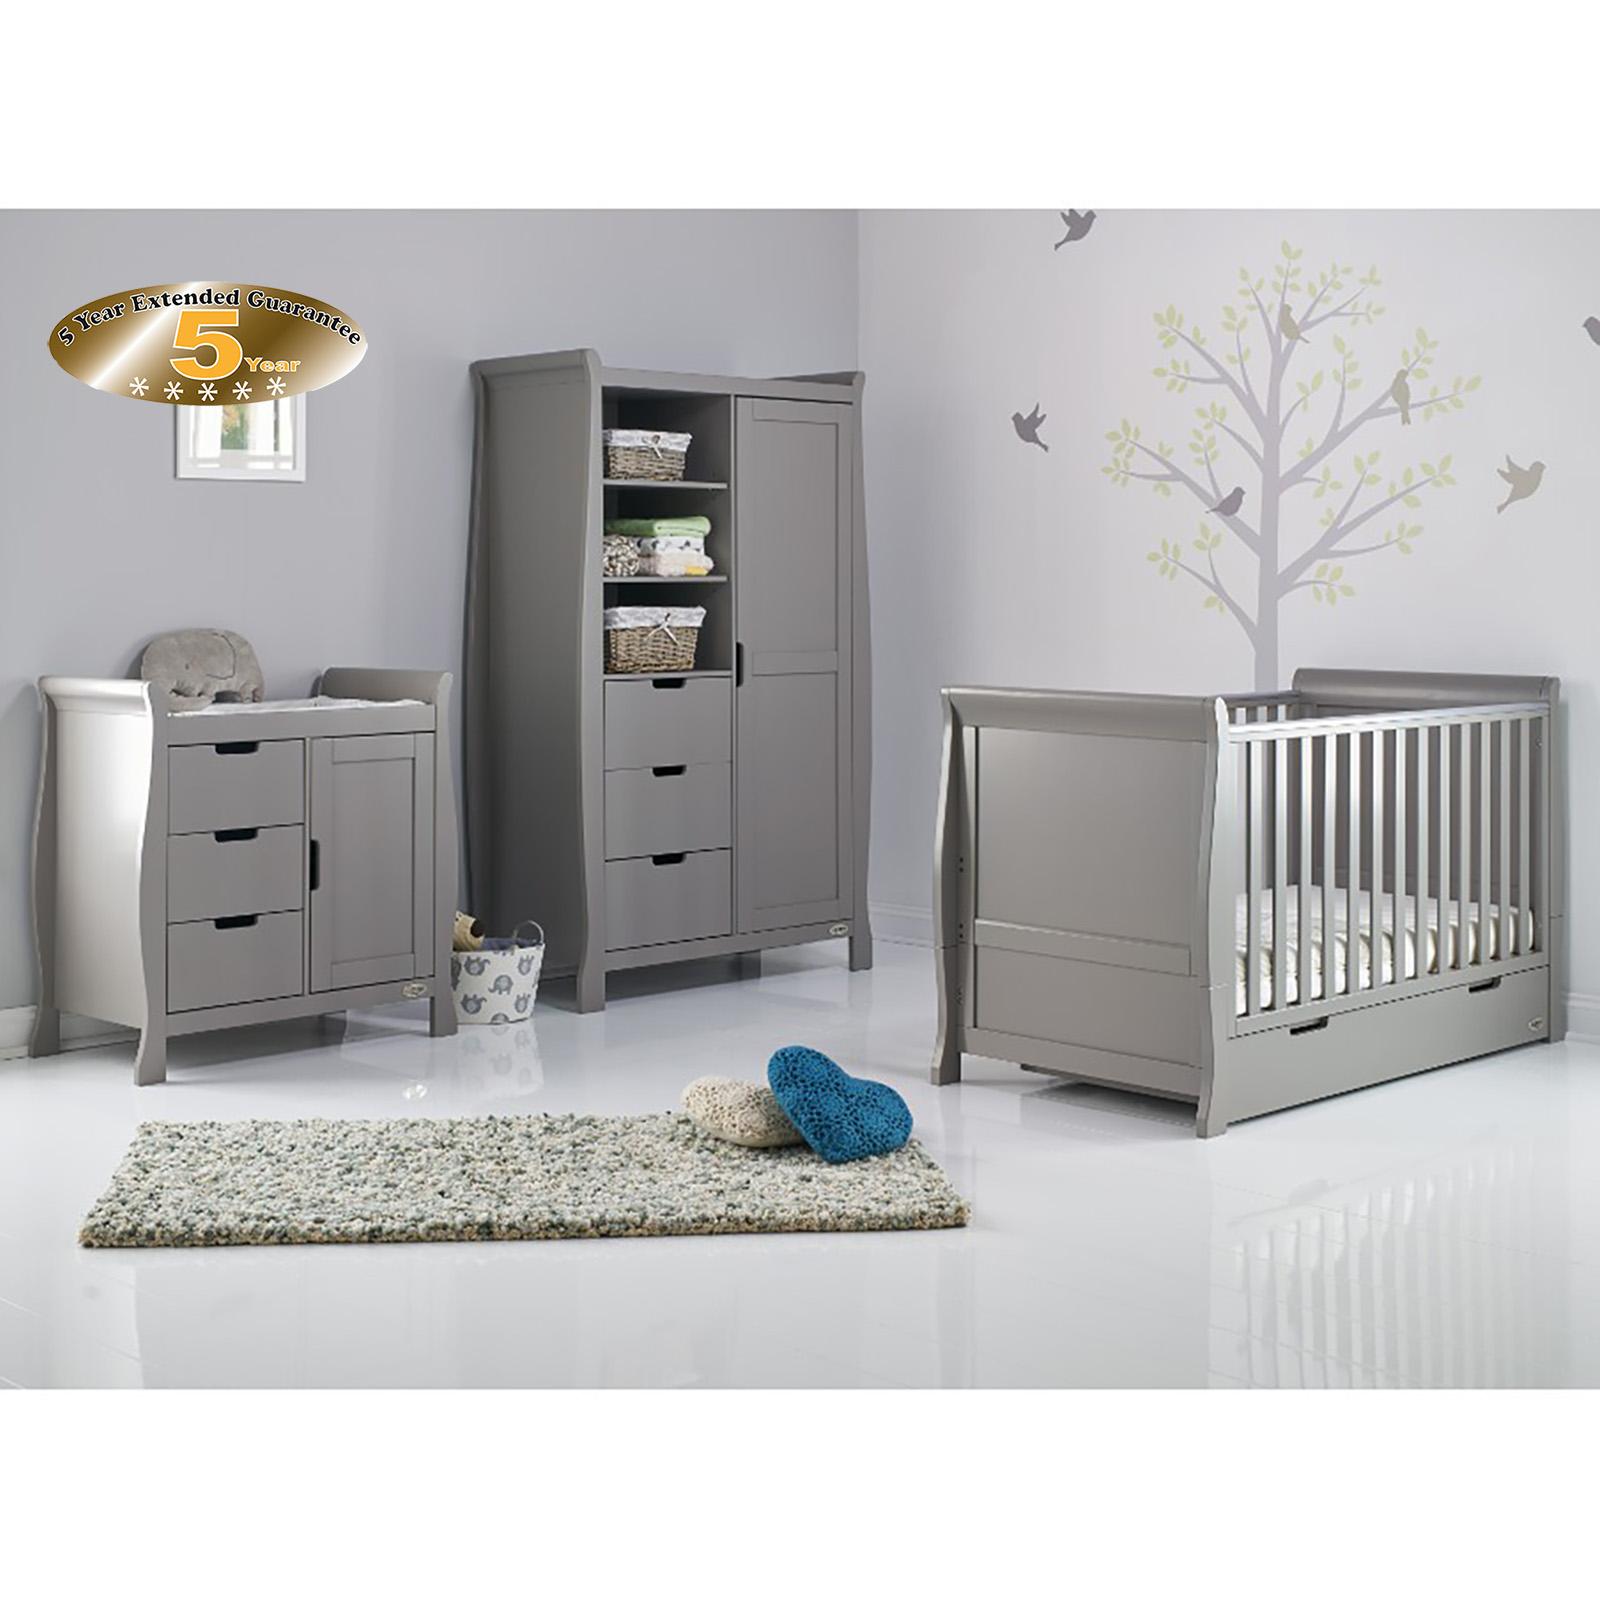 Incroyable Obaby Stamford Classic Sleigh 3 Piece Nursery Room Set   Taupe Grey